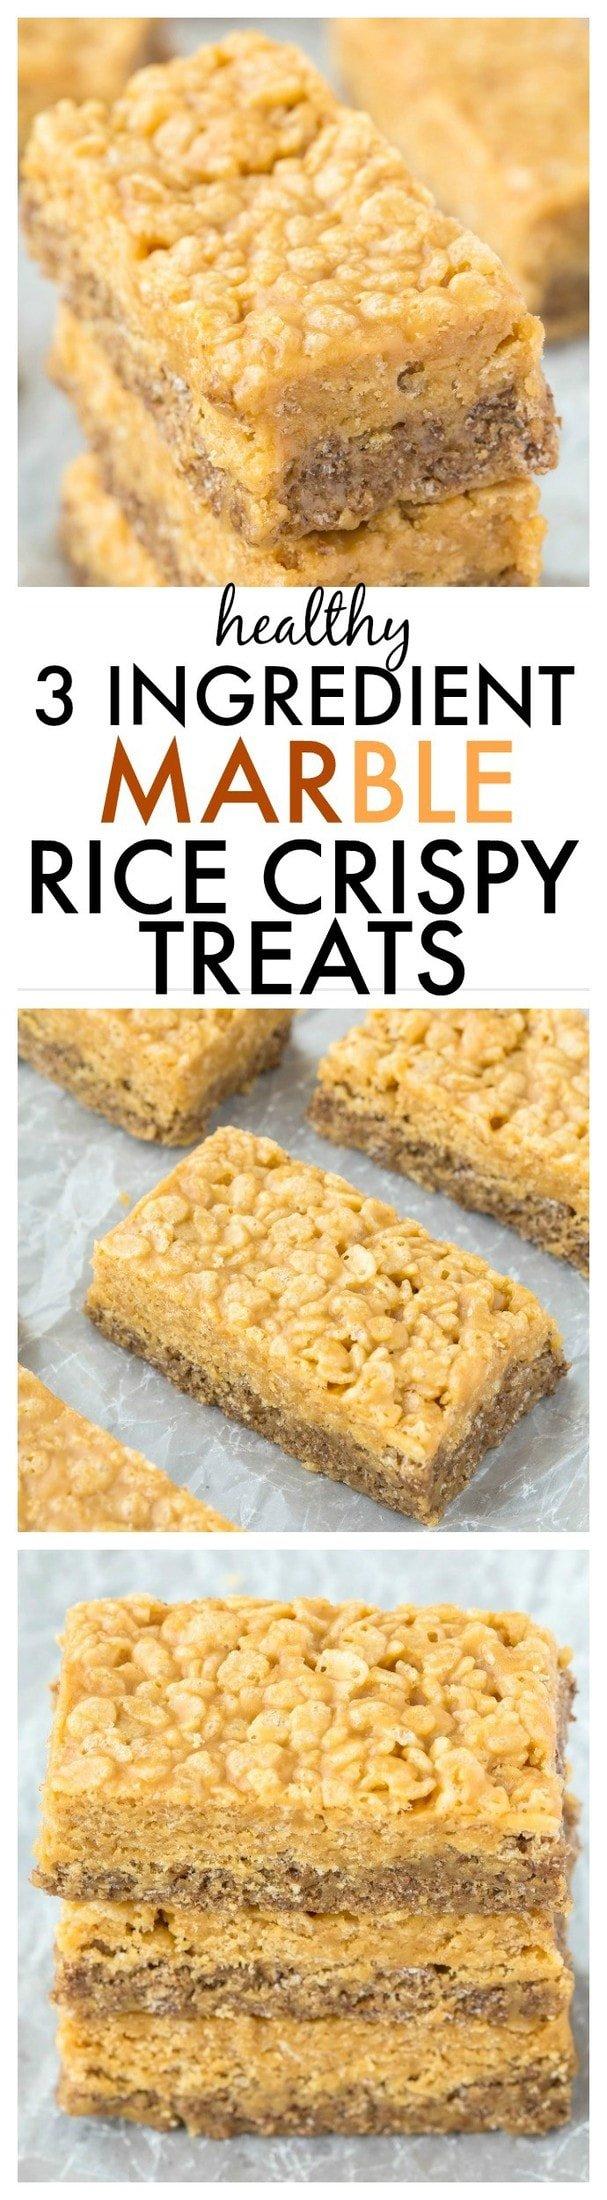 Healthy 3 Ingredient MARBLE rice crispy treats- Half original, half chocolate- NO nasties and just THREE healthy ingredients- No baking required! {vegan, gluten free recipe}